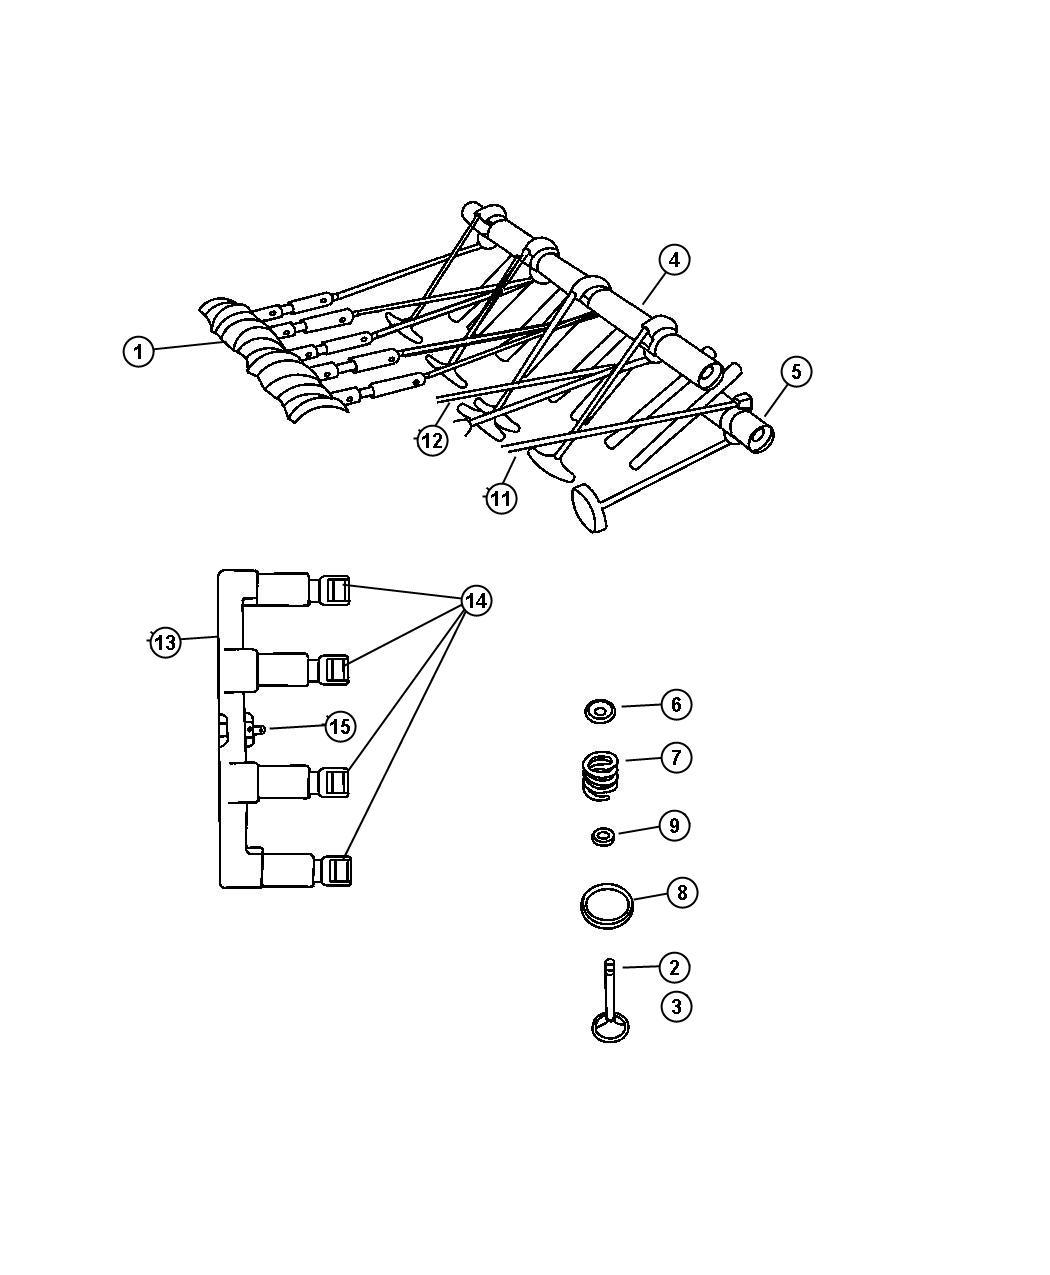 Dodge Ram Used For Lifters And Yoke Hydraulic Engine Camshaft Valvetrain Hemi